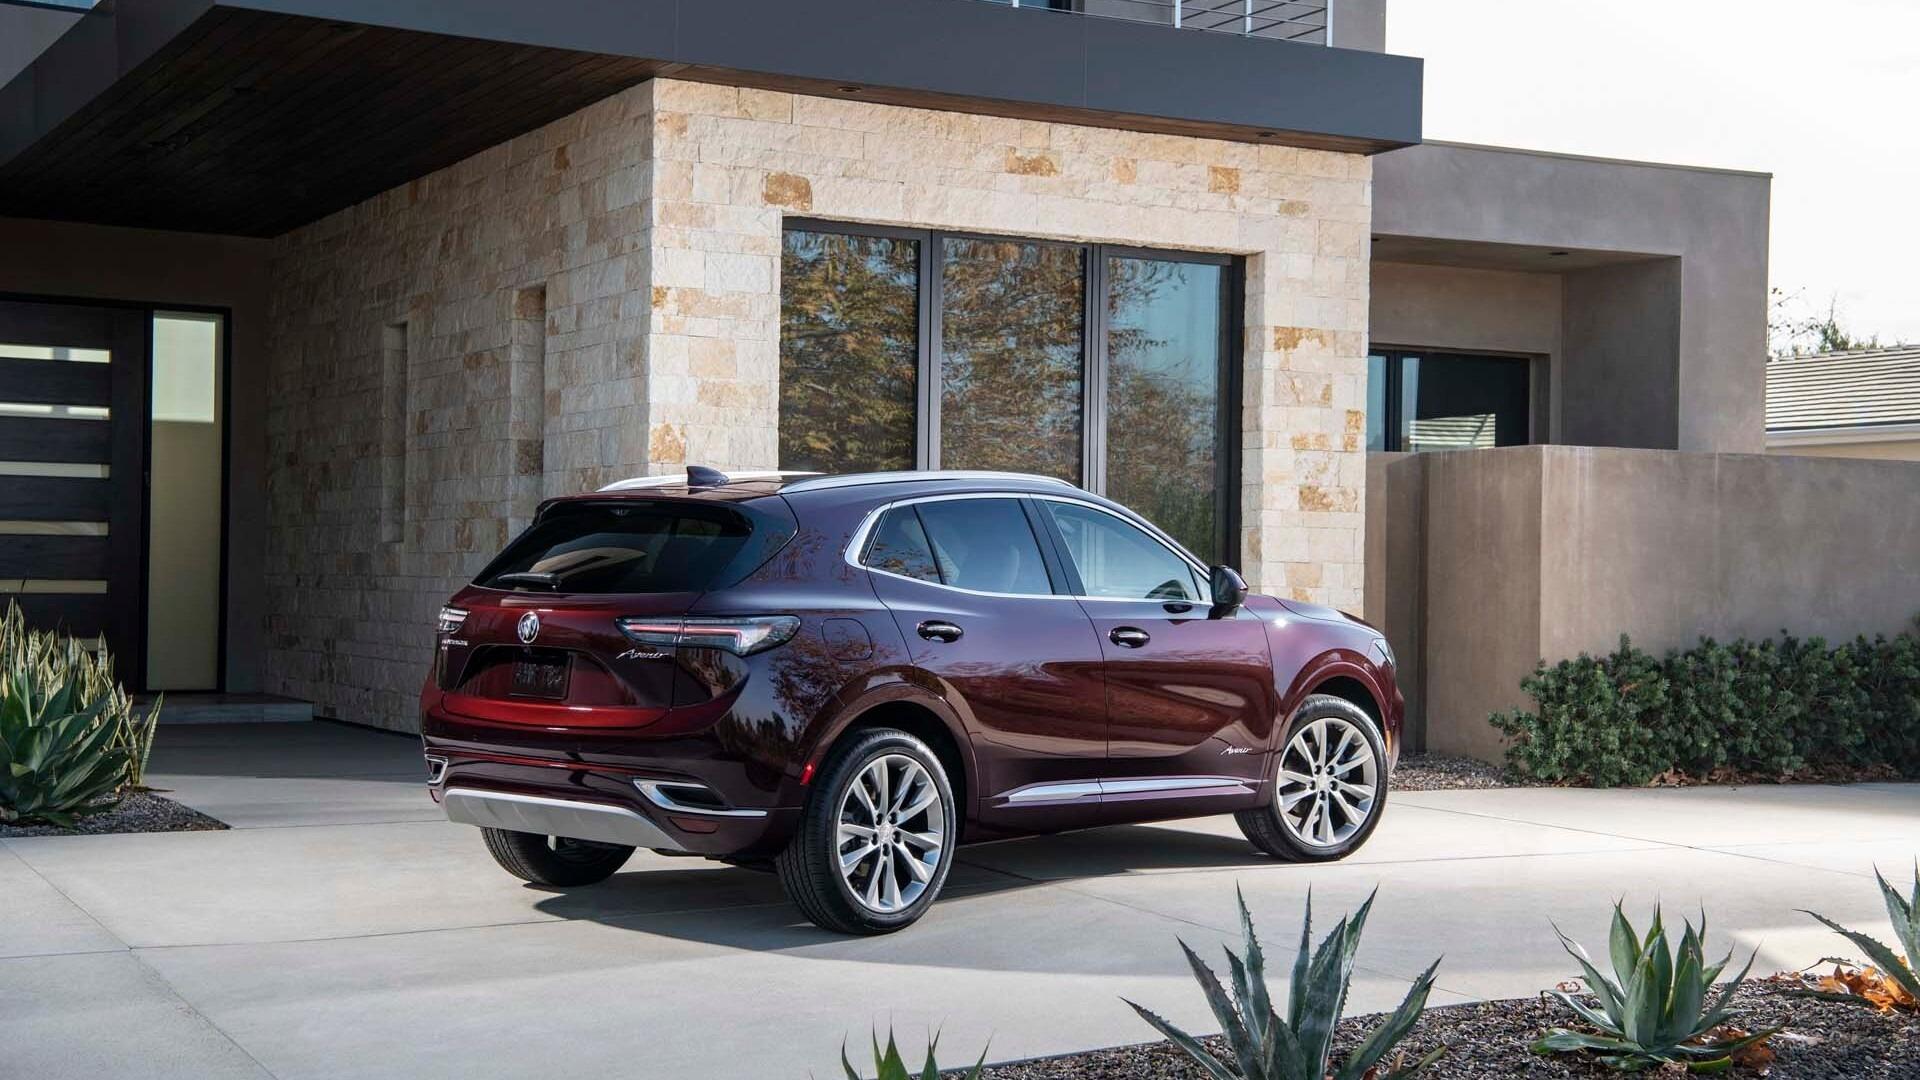 2023 Buick Envision Drivetrain